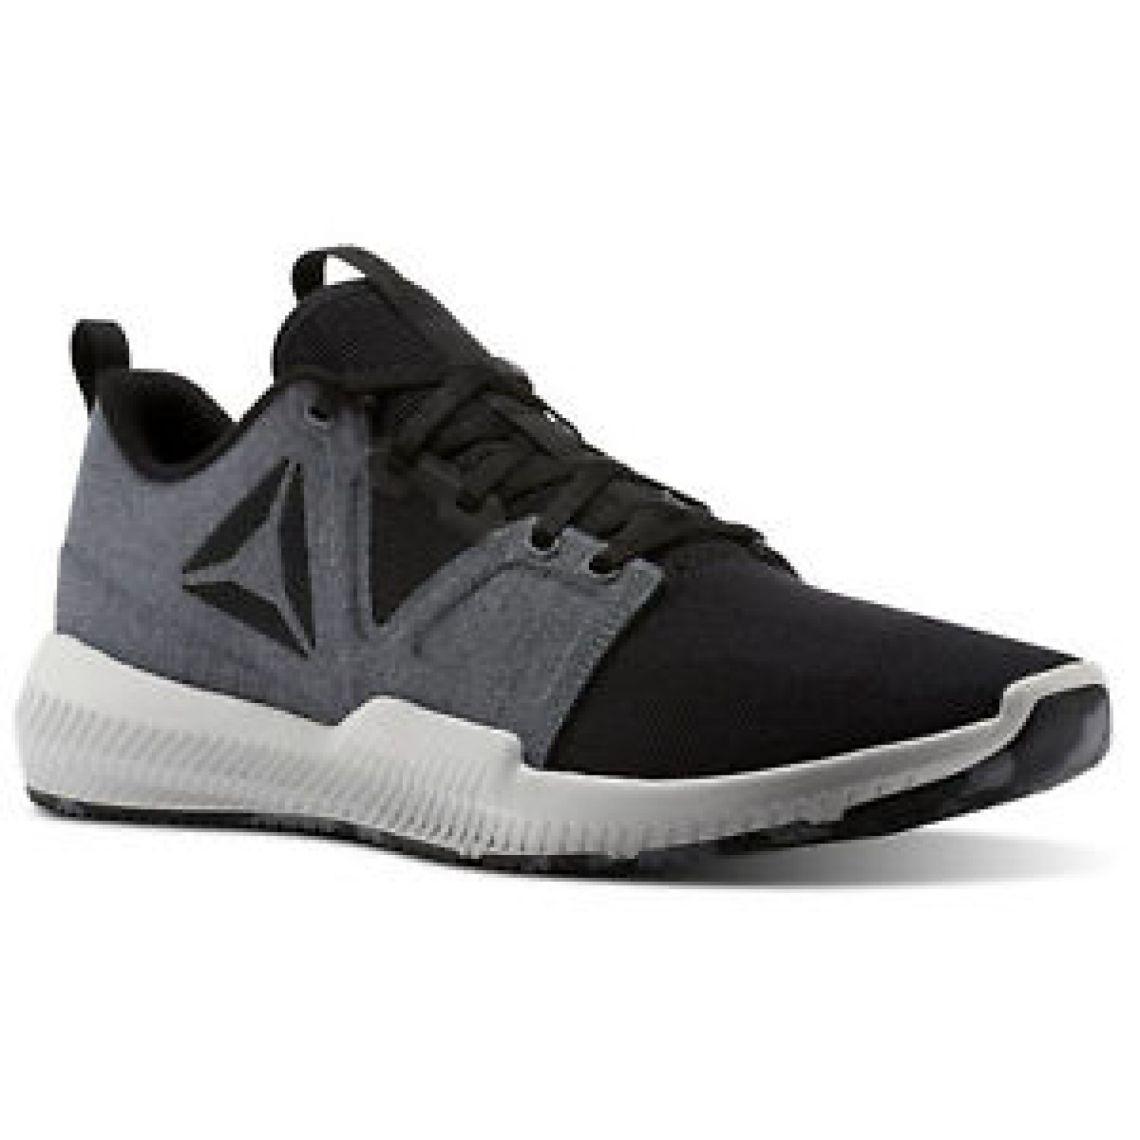 Reebok Men's Hydrorush TR Shoes | eBay